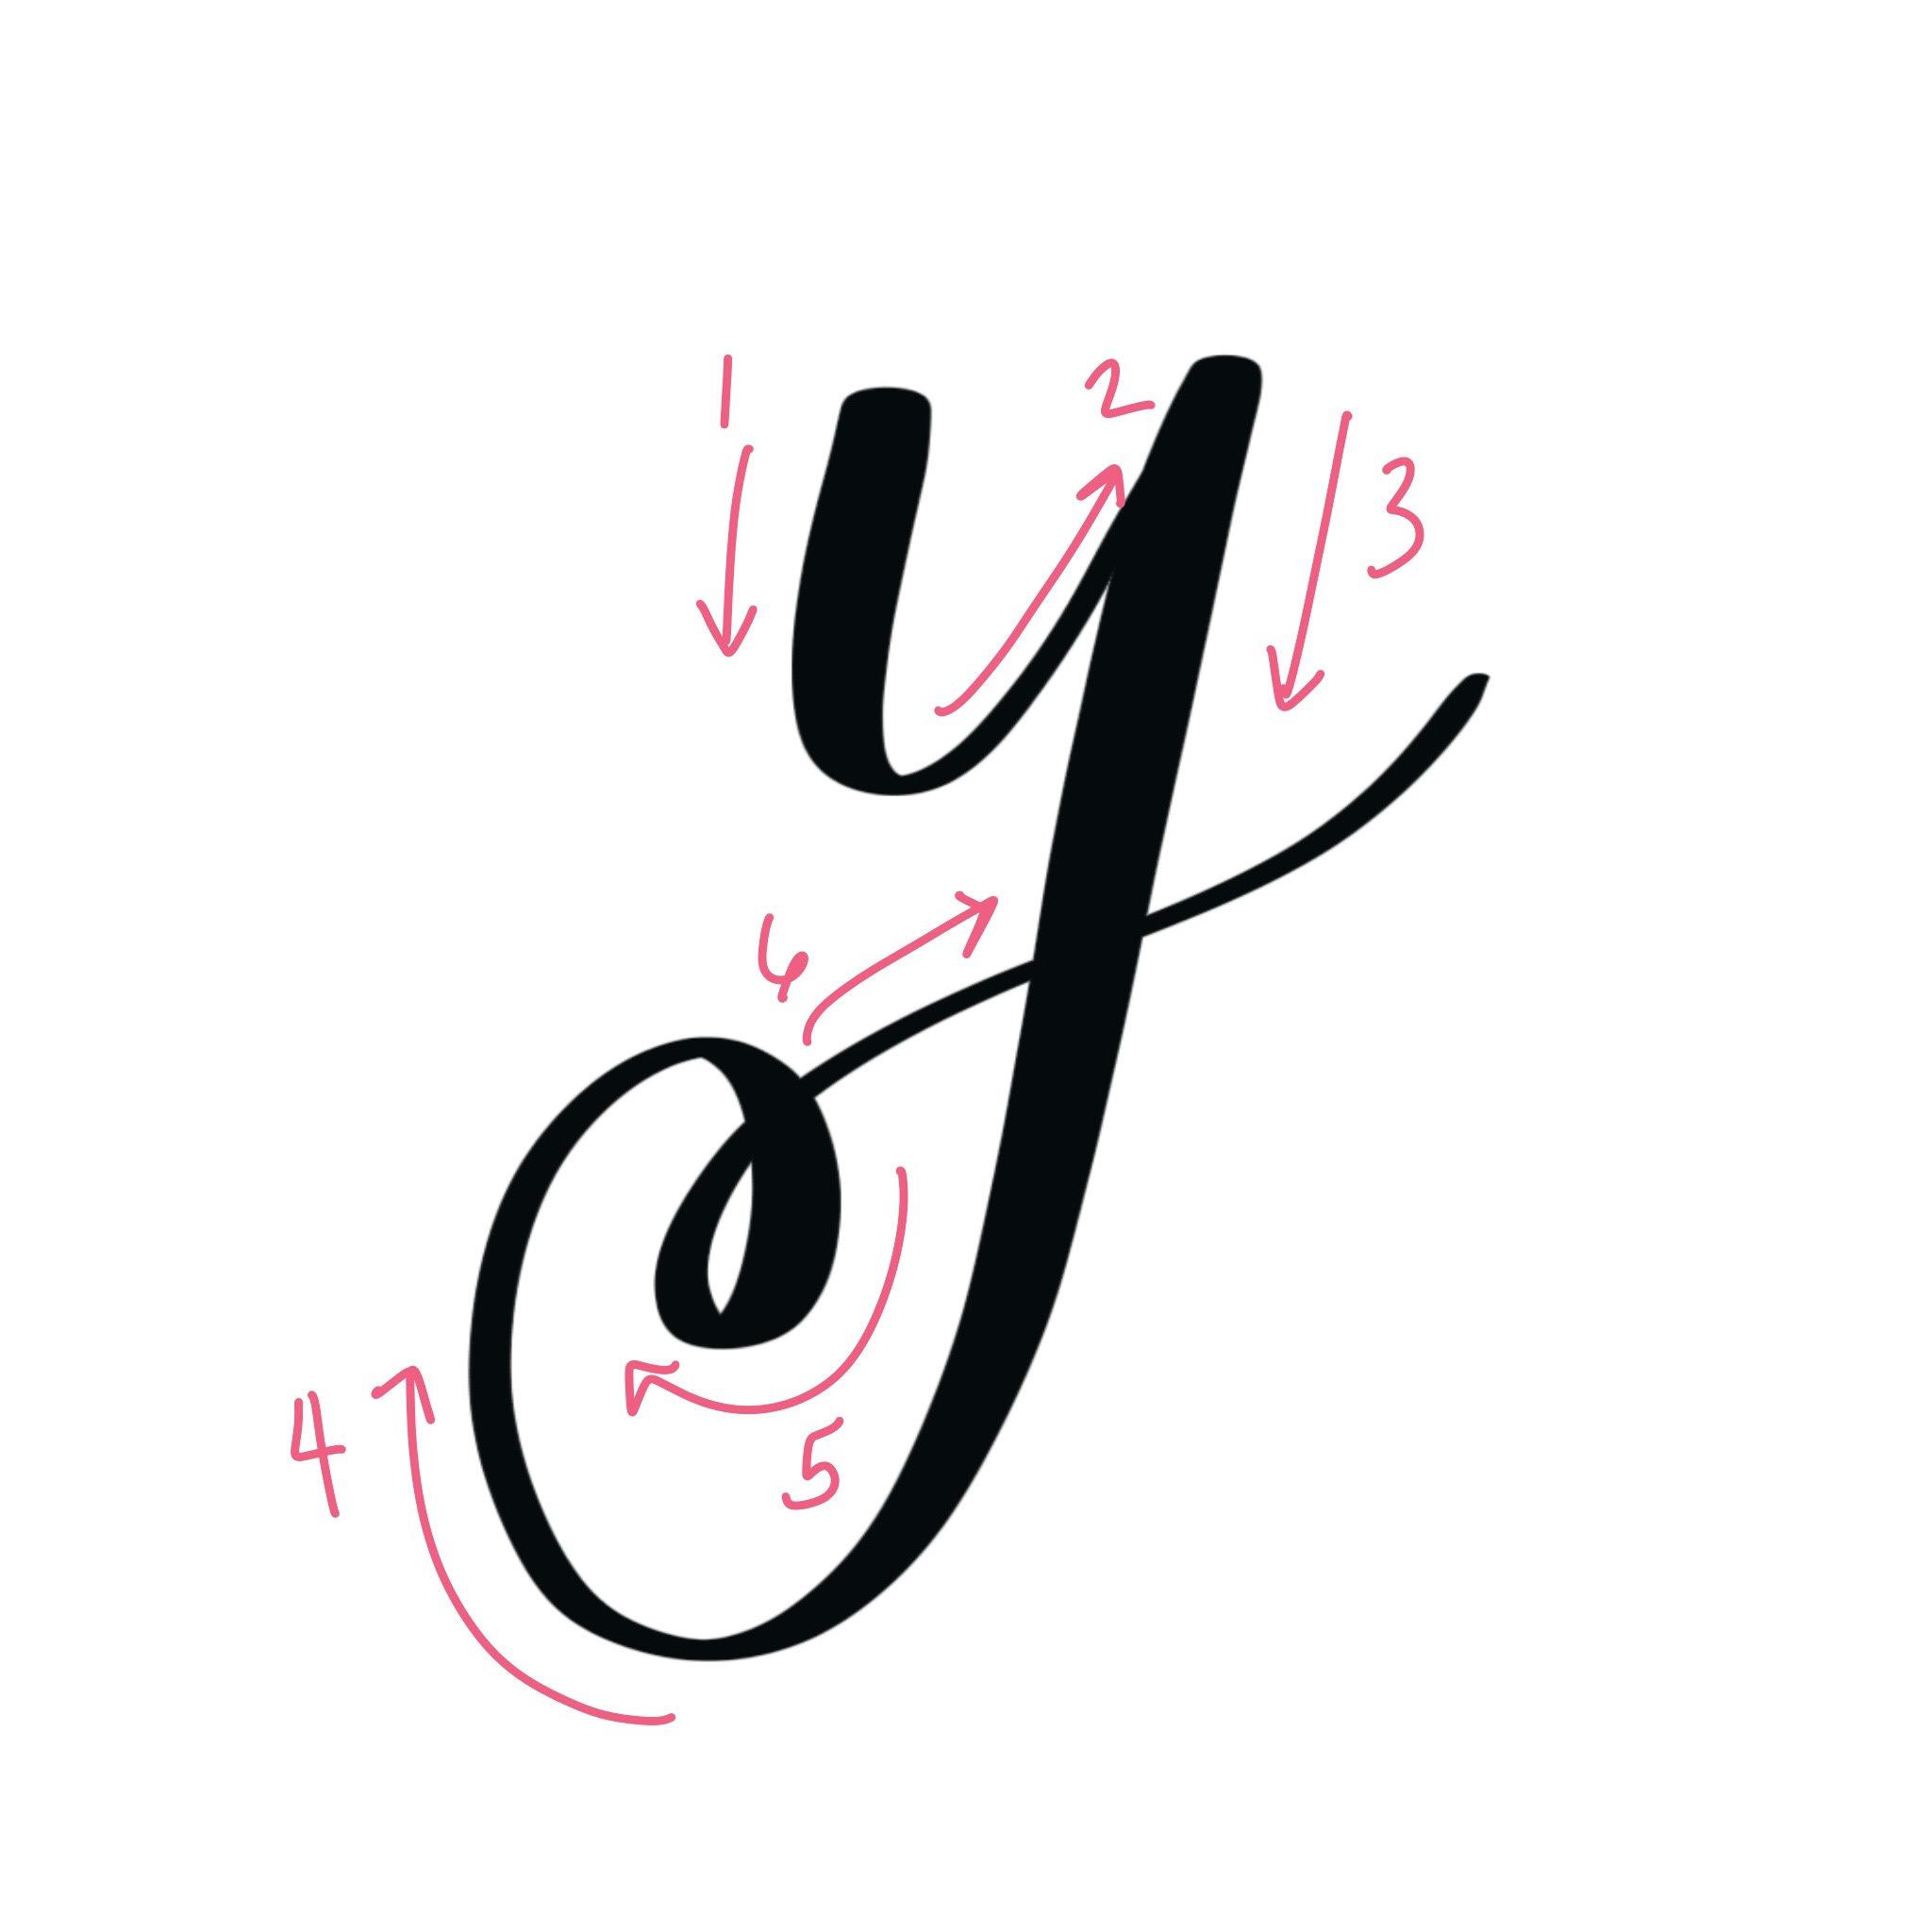 Descender Letter Flourishes & Free Practice Sheets